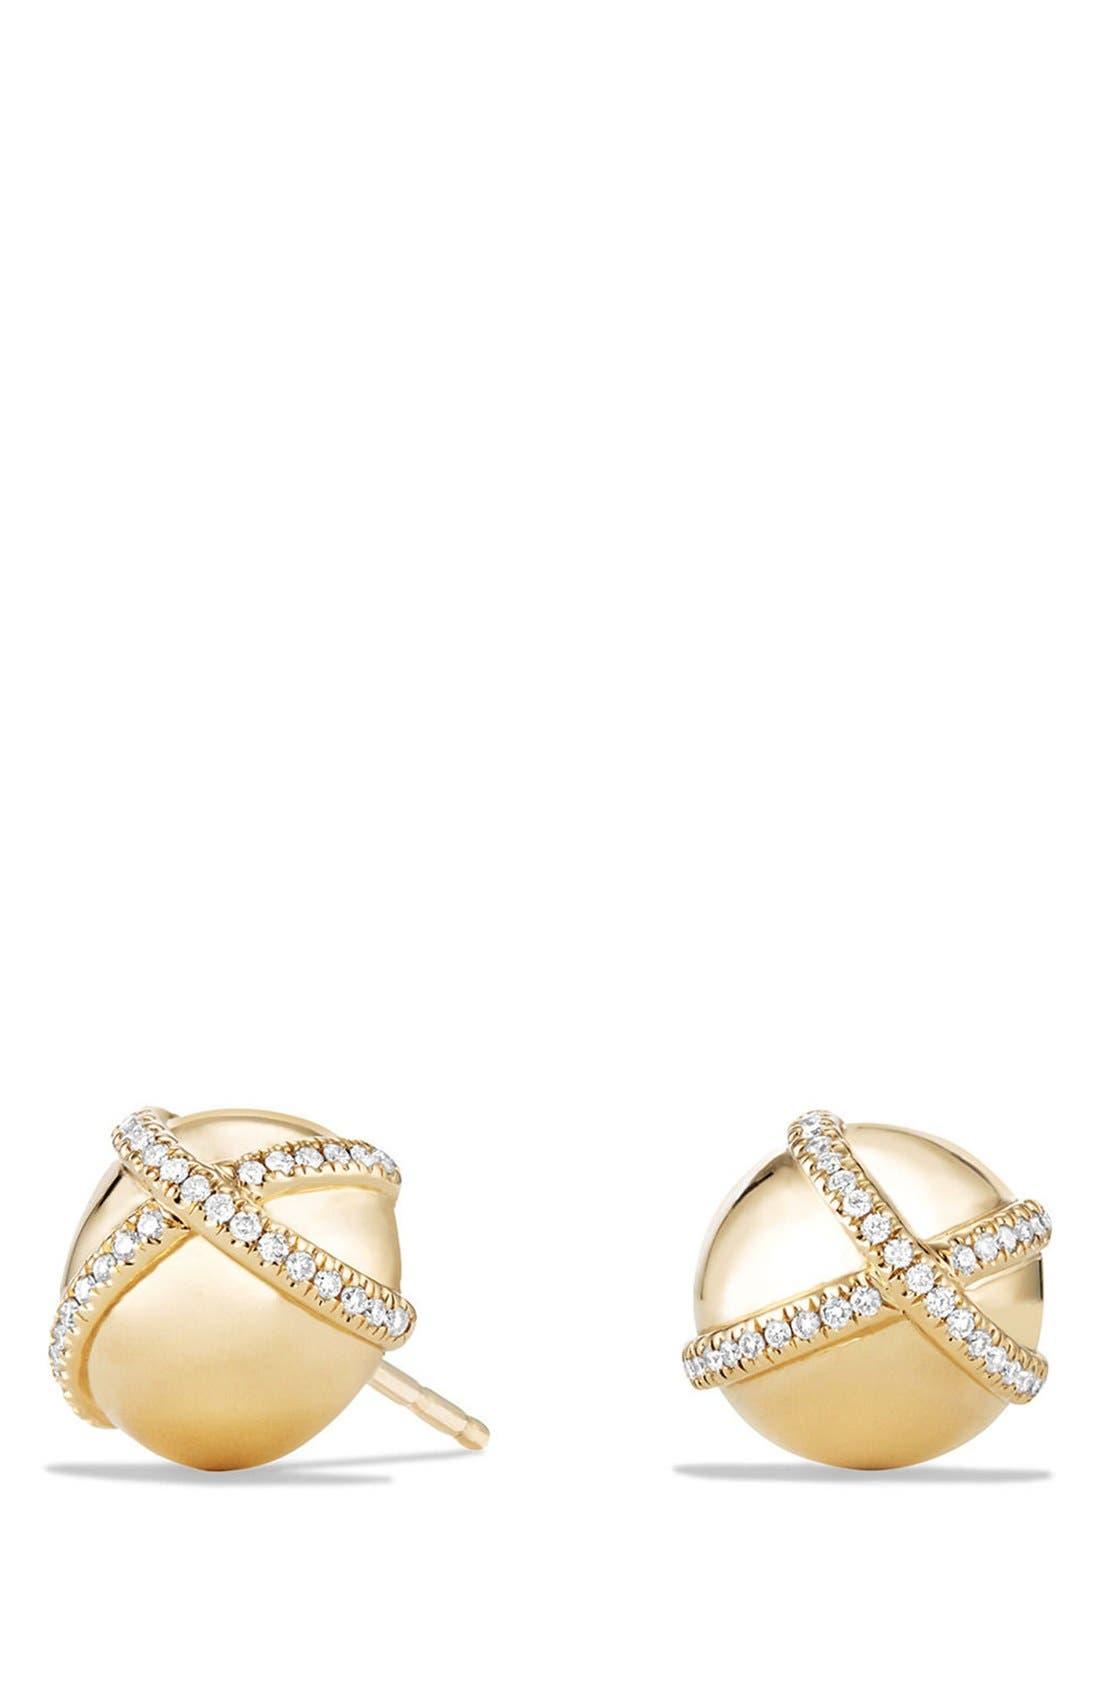 david yurman wrap stud earrings with pav diamonds in 18k gold